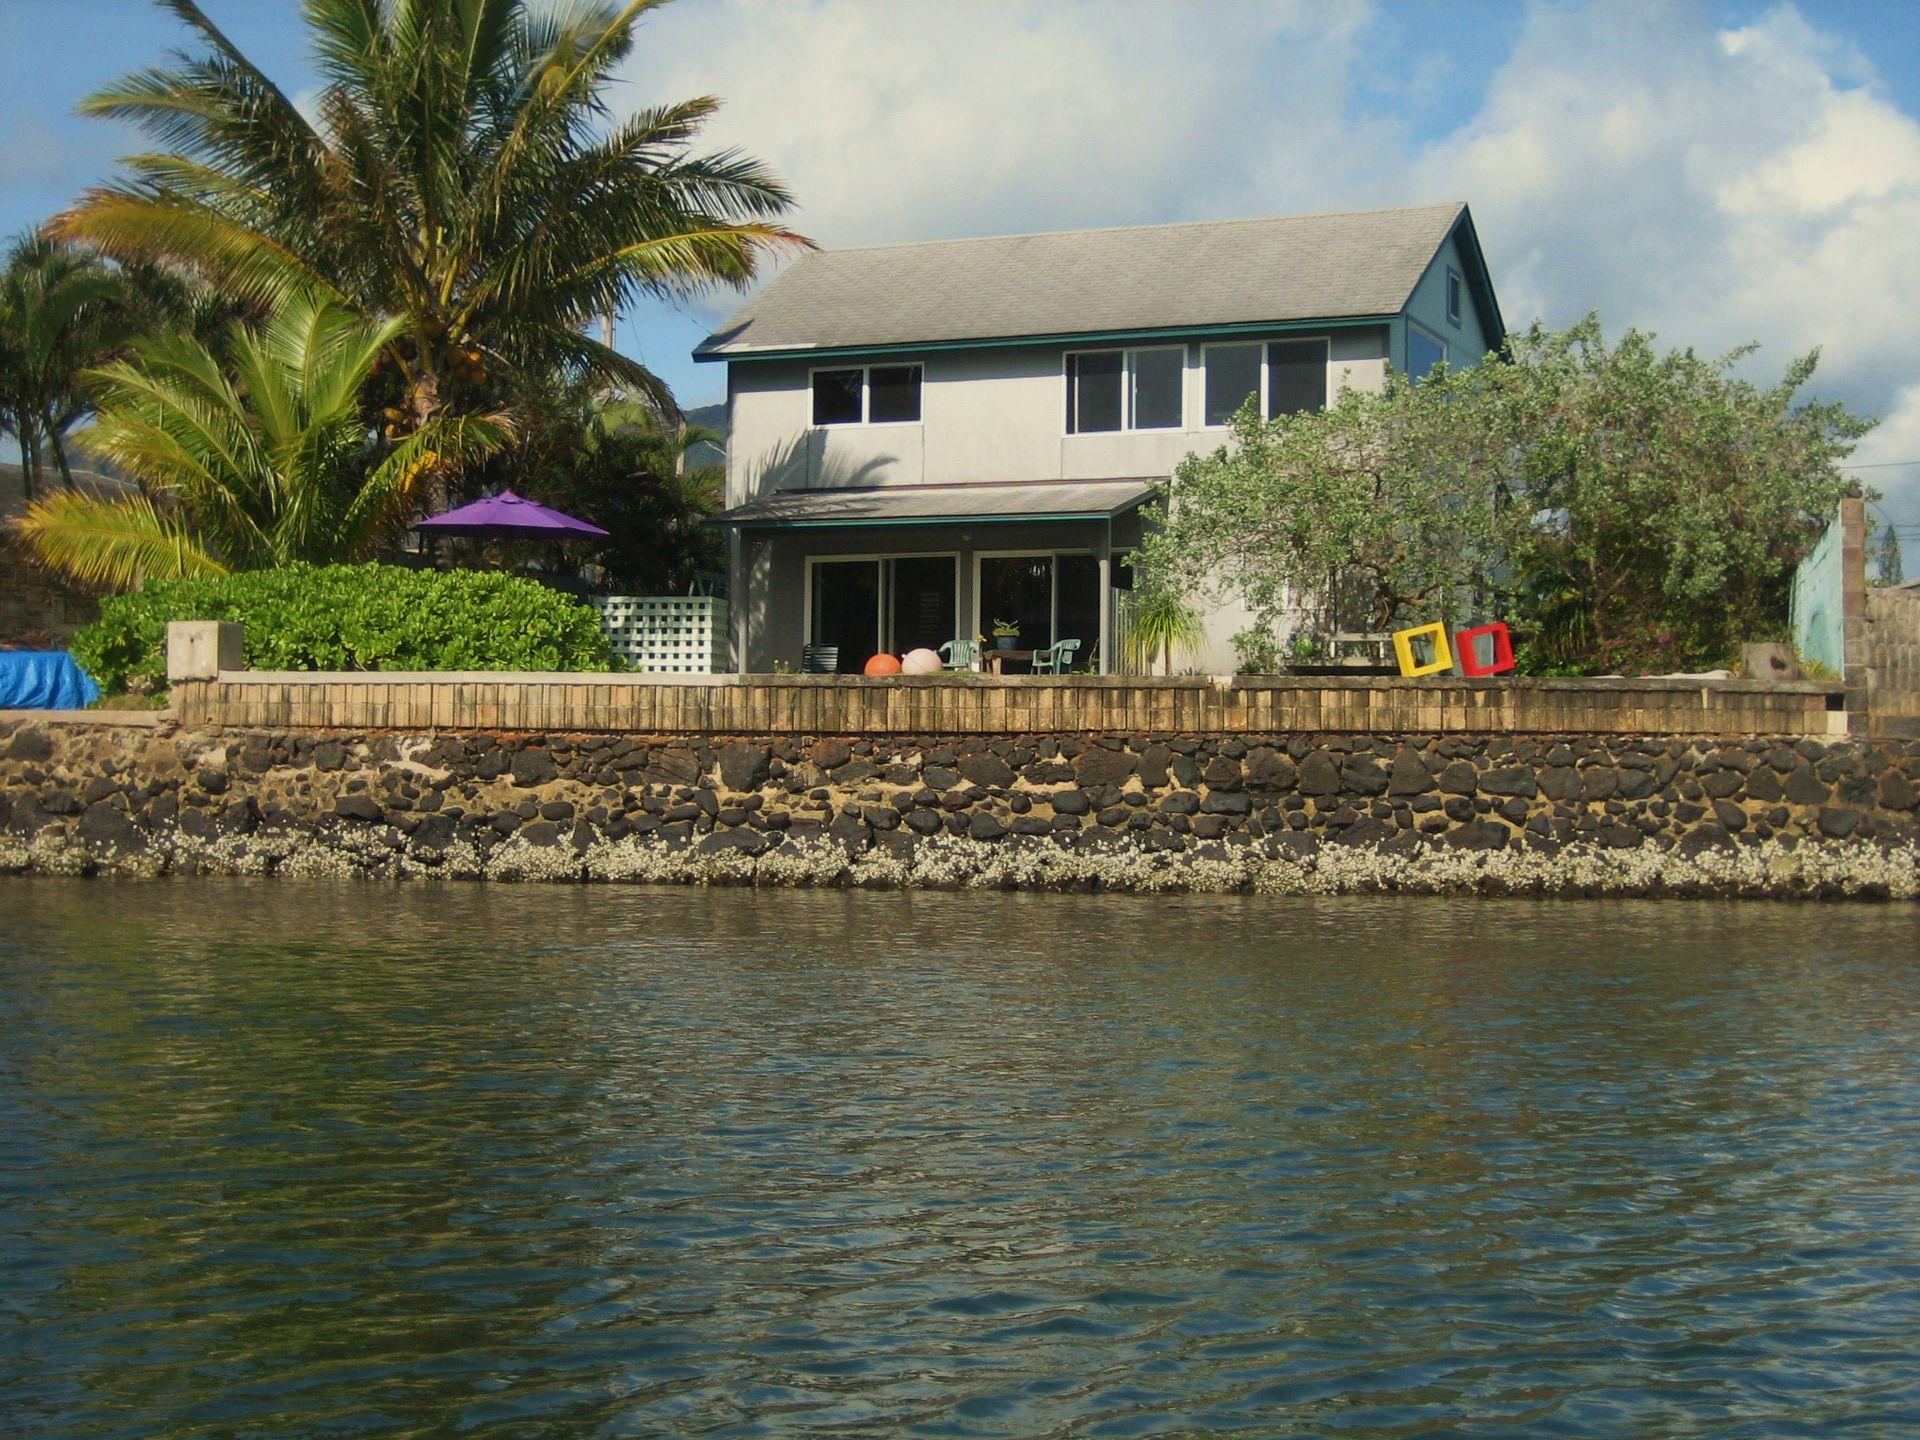 Hawaii water front house on Kaneohe Bay, Oahu, Hawaii - Home Exchange